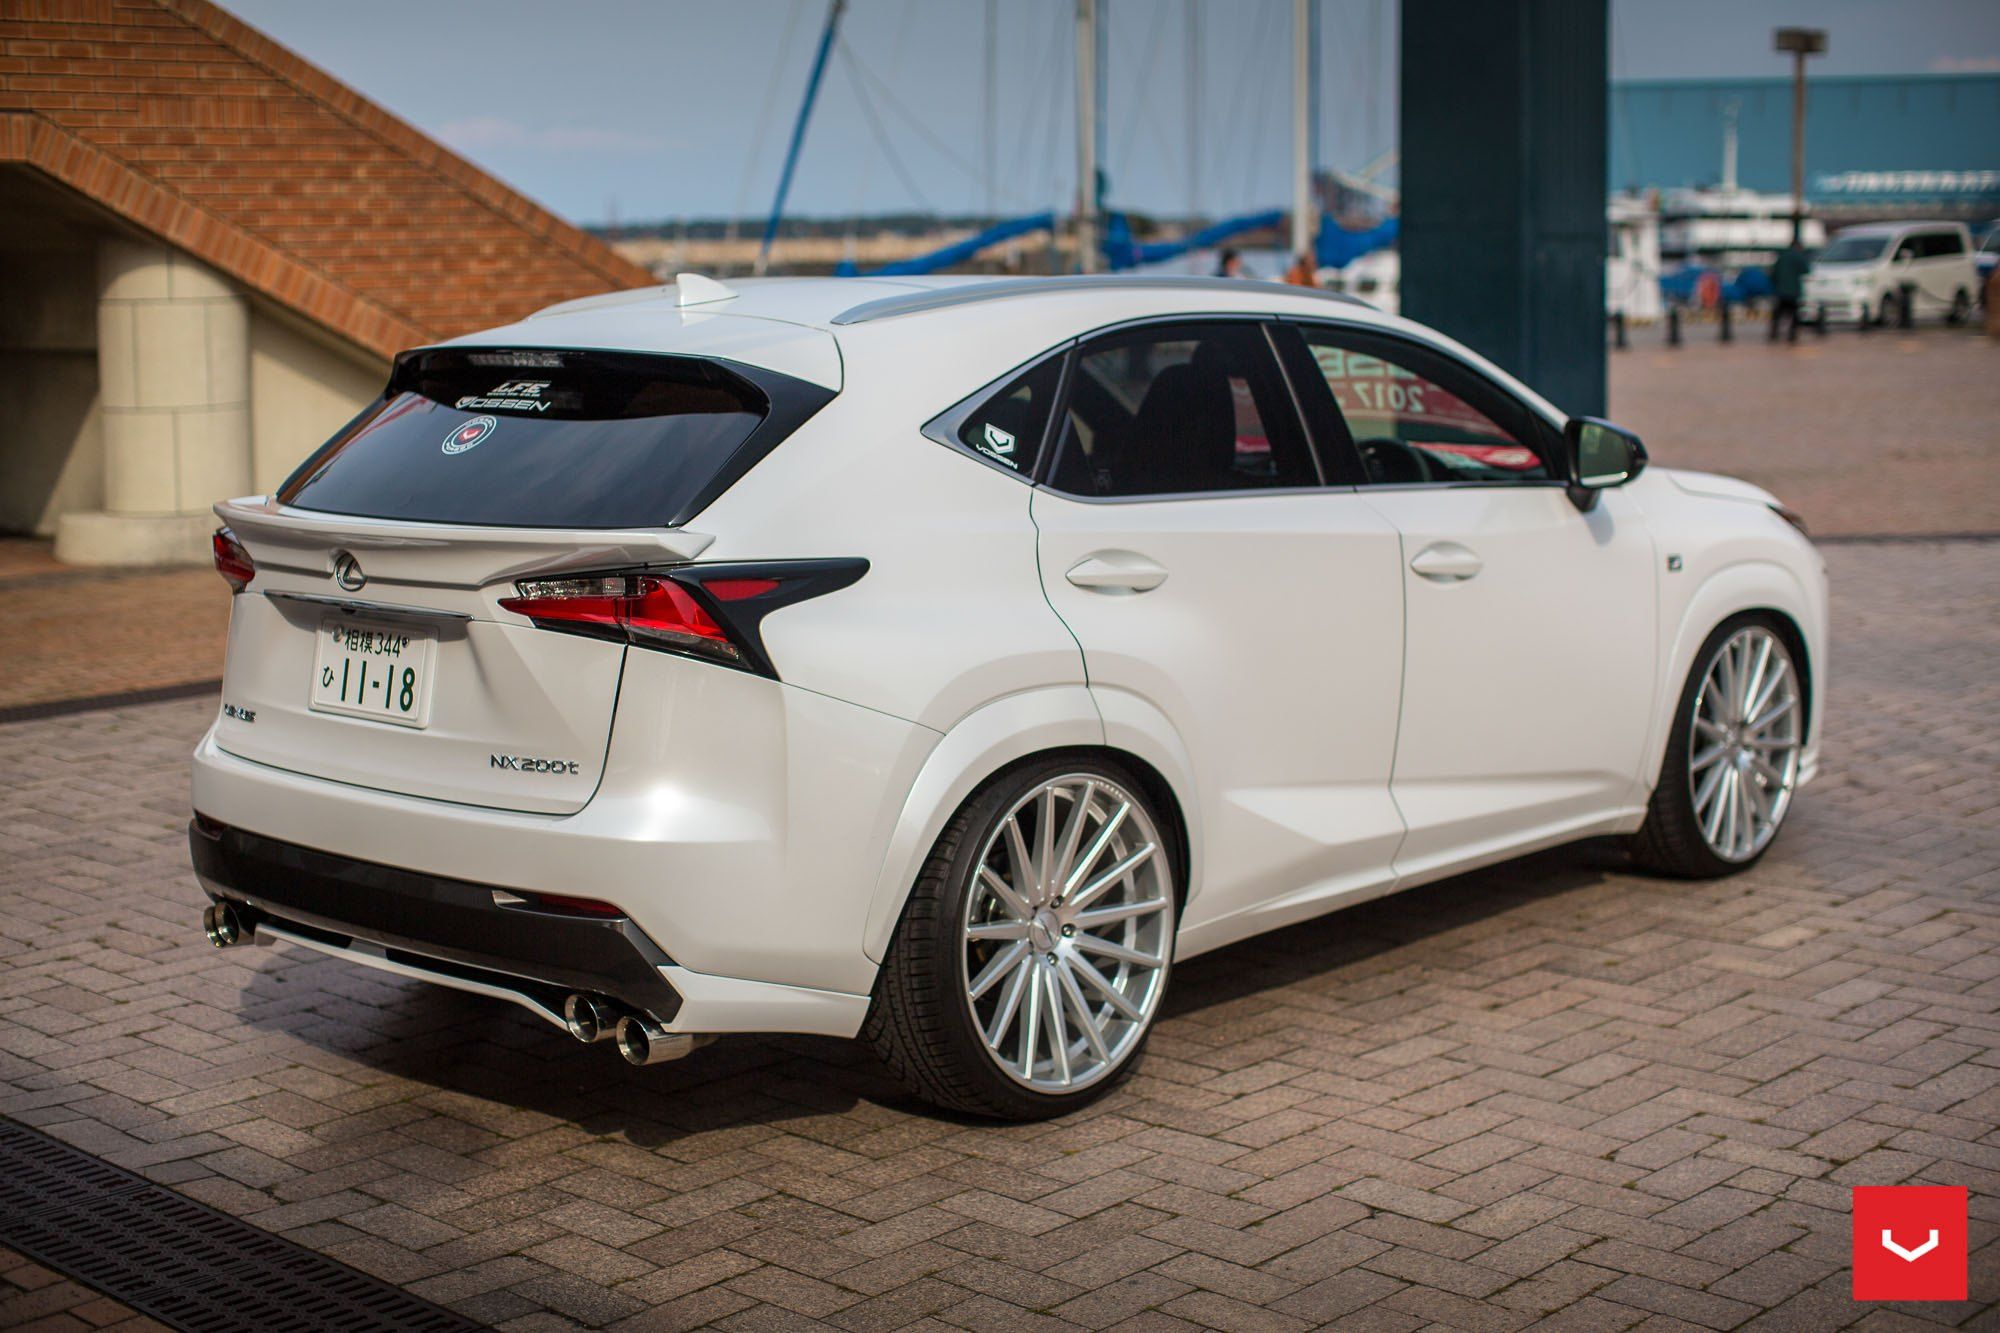 2020 Lexus Rx 450h F Sport White Nova Glass Flake Driving Interior Lexus Luxury Crossovers Glass